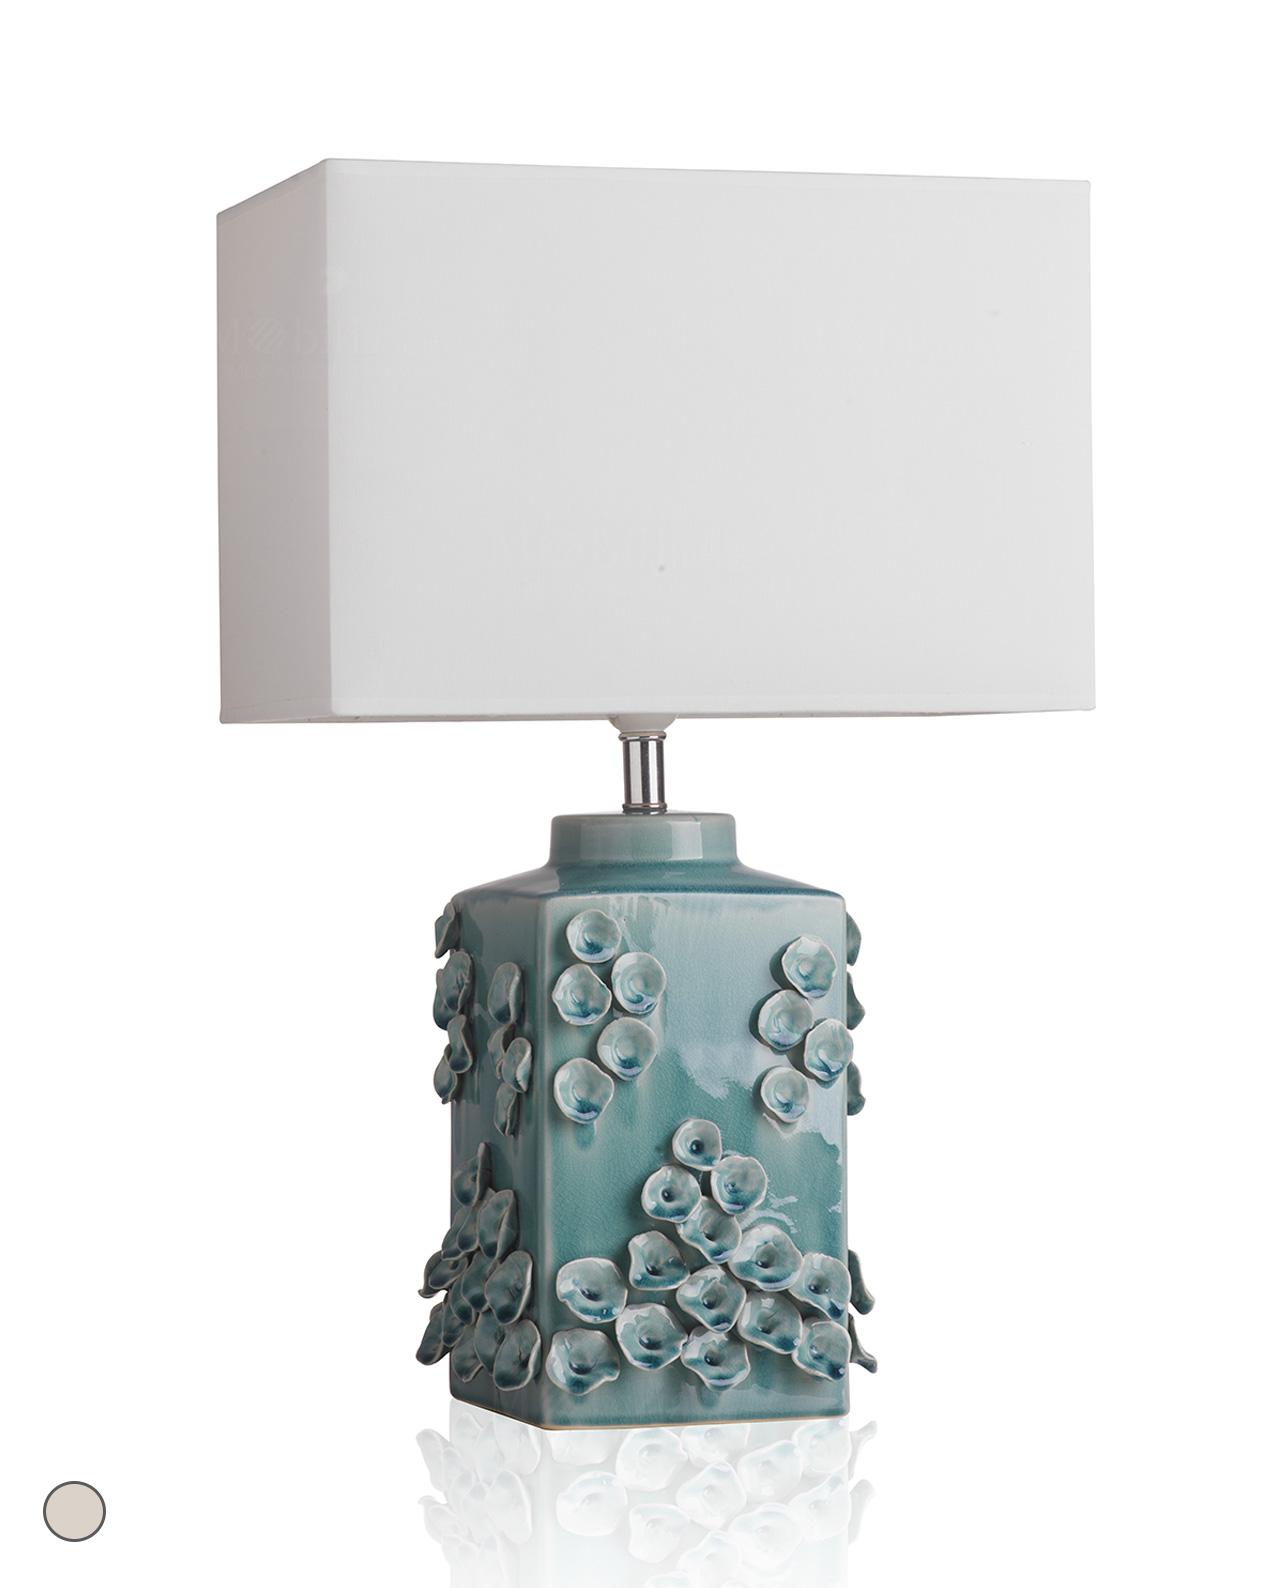 Brandani Lampada Da Terra.Lampada In Ceramica Agata Brandani Vari Colori Mobilia Store Home